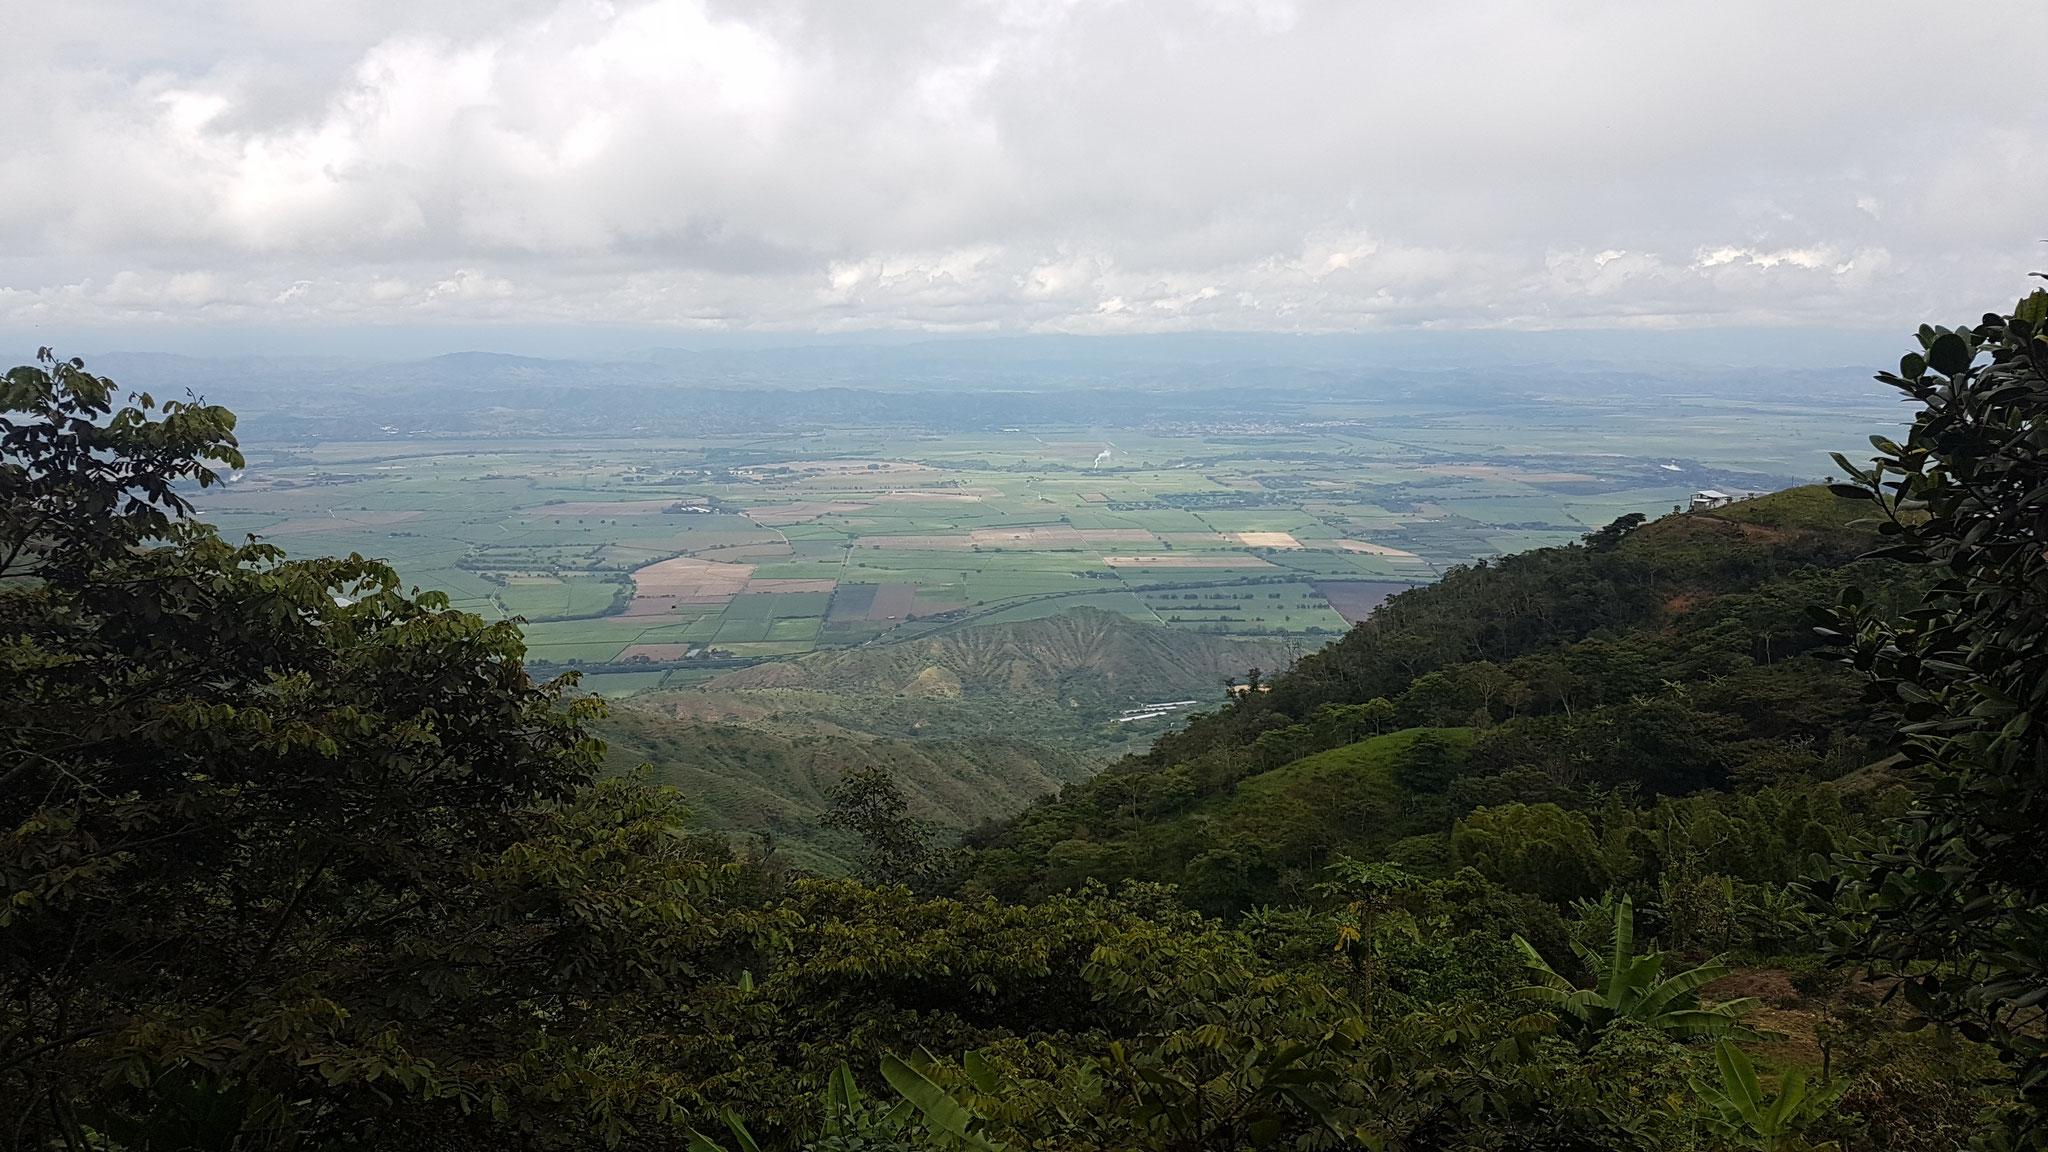 Vue de la Vallée del Cauca depuis la Finca